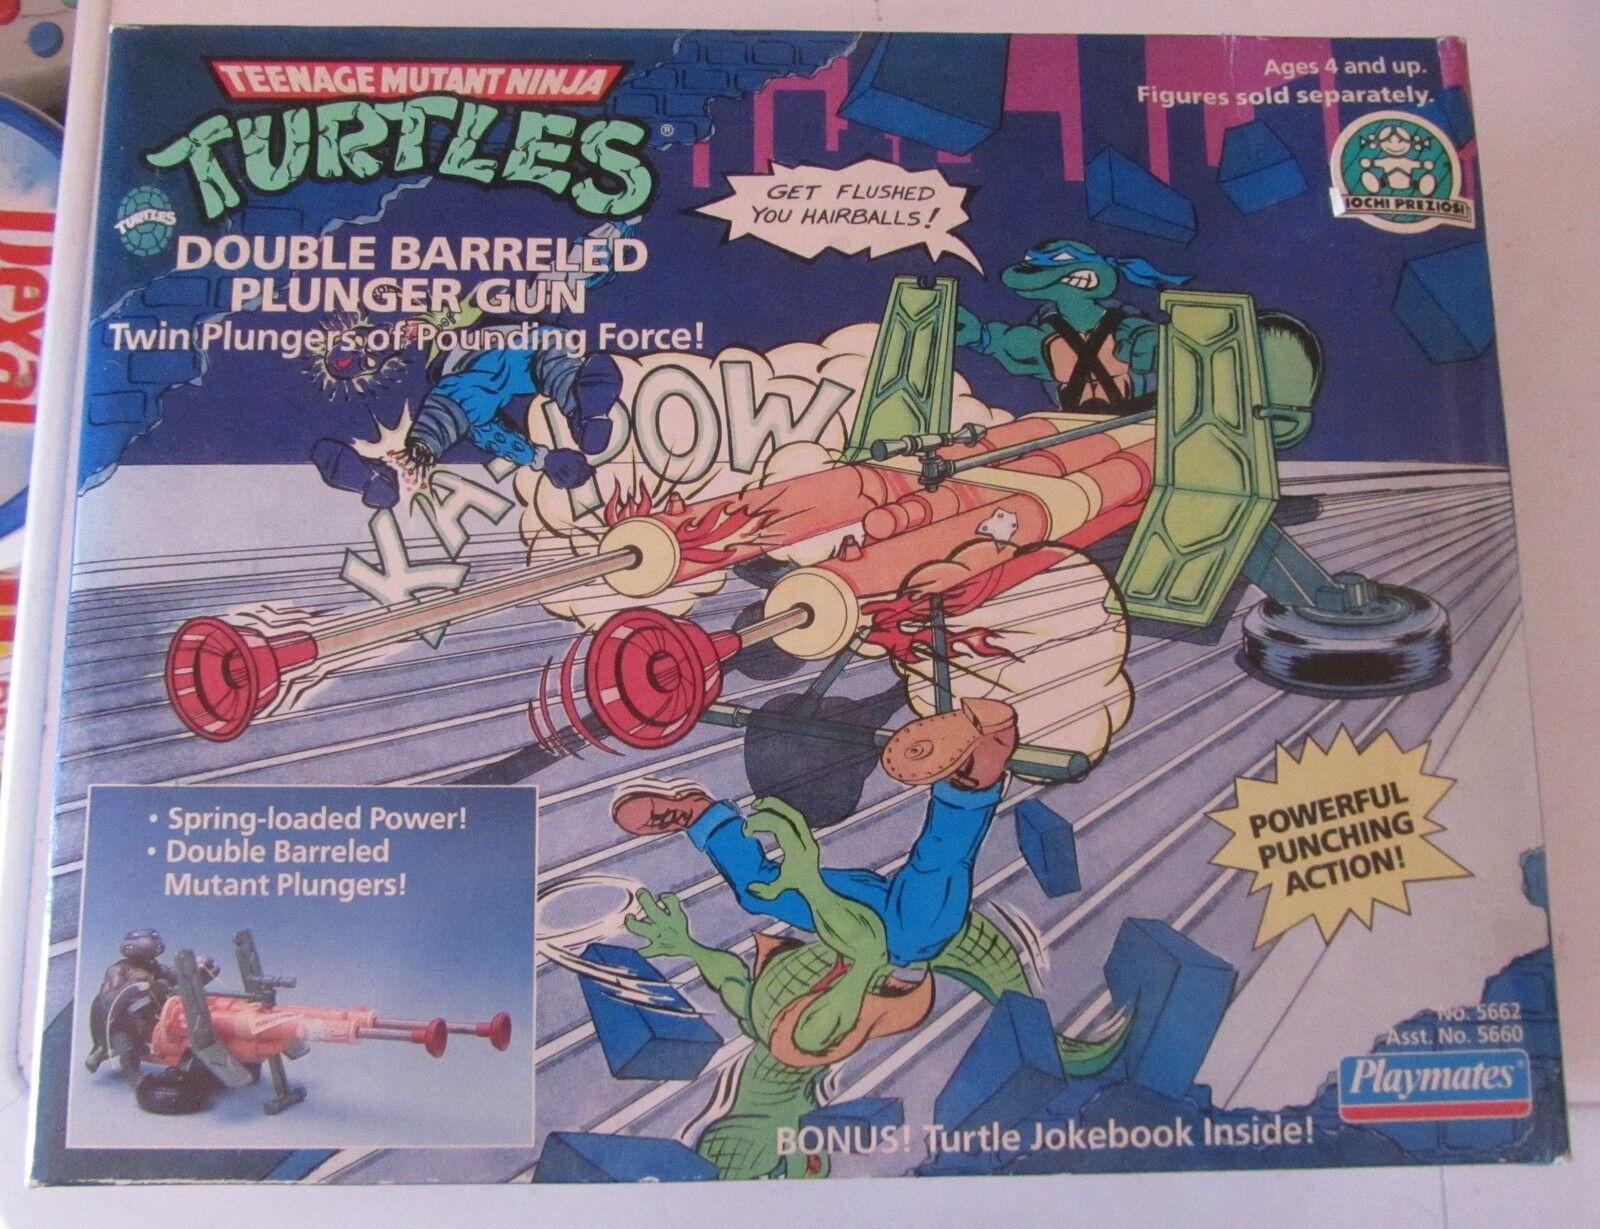 TMNT Ninja Turtles Tartarughe Double Barreled Plunger Gun Playmates Spese Gratis